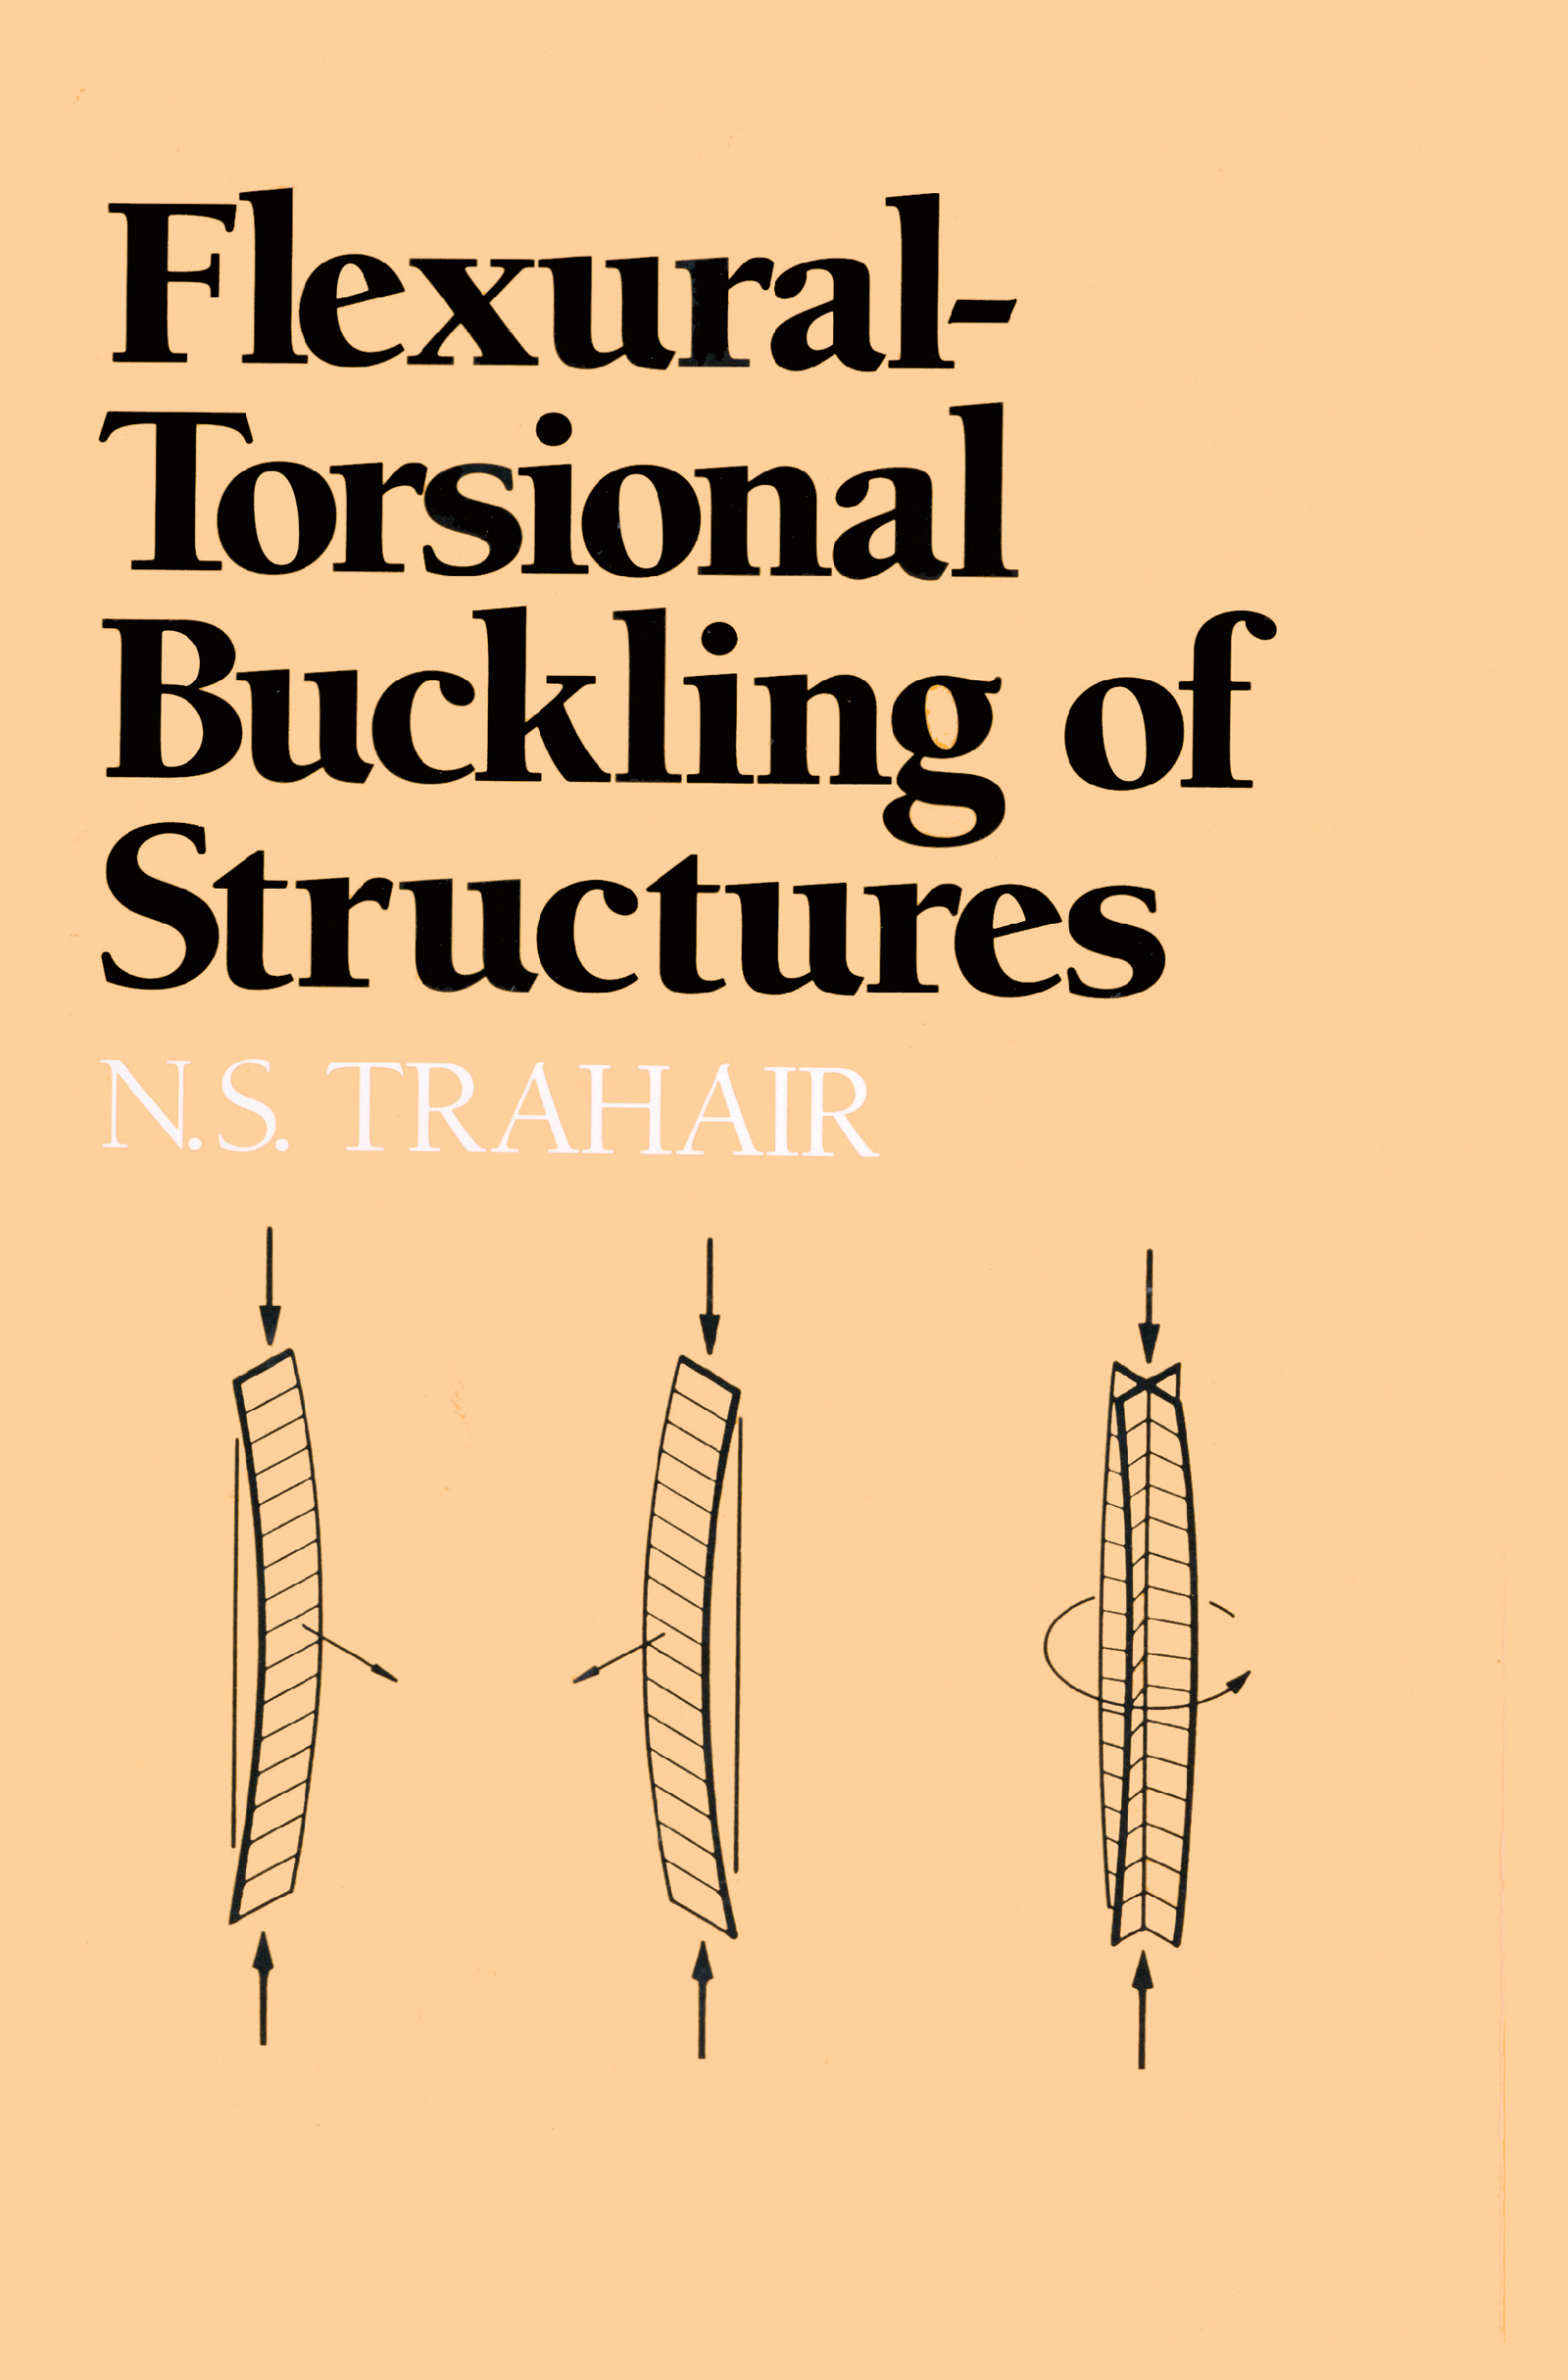 Flexural-Torsional Buckling of Structures